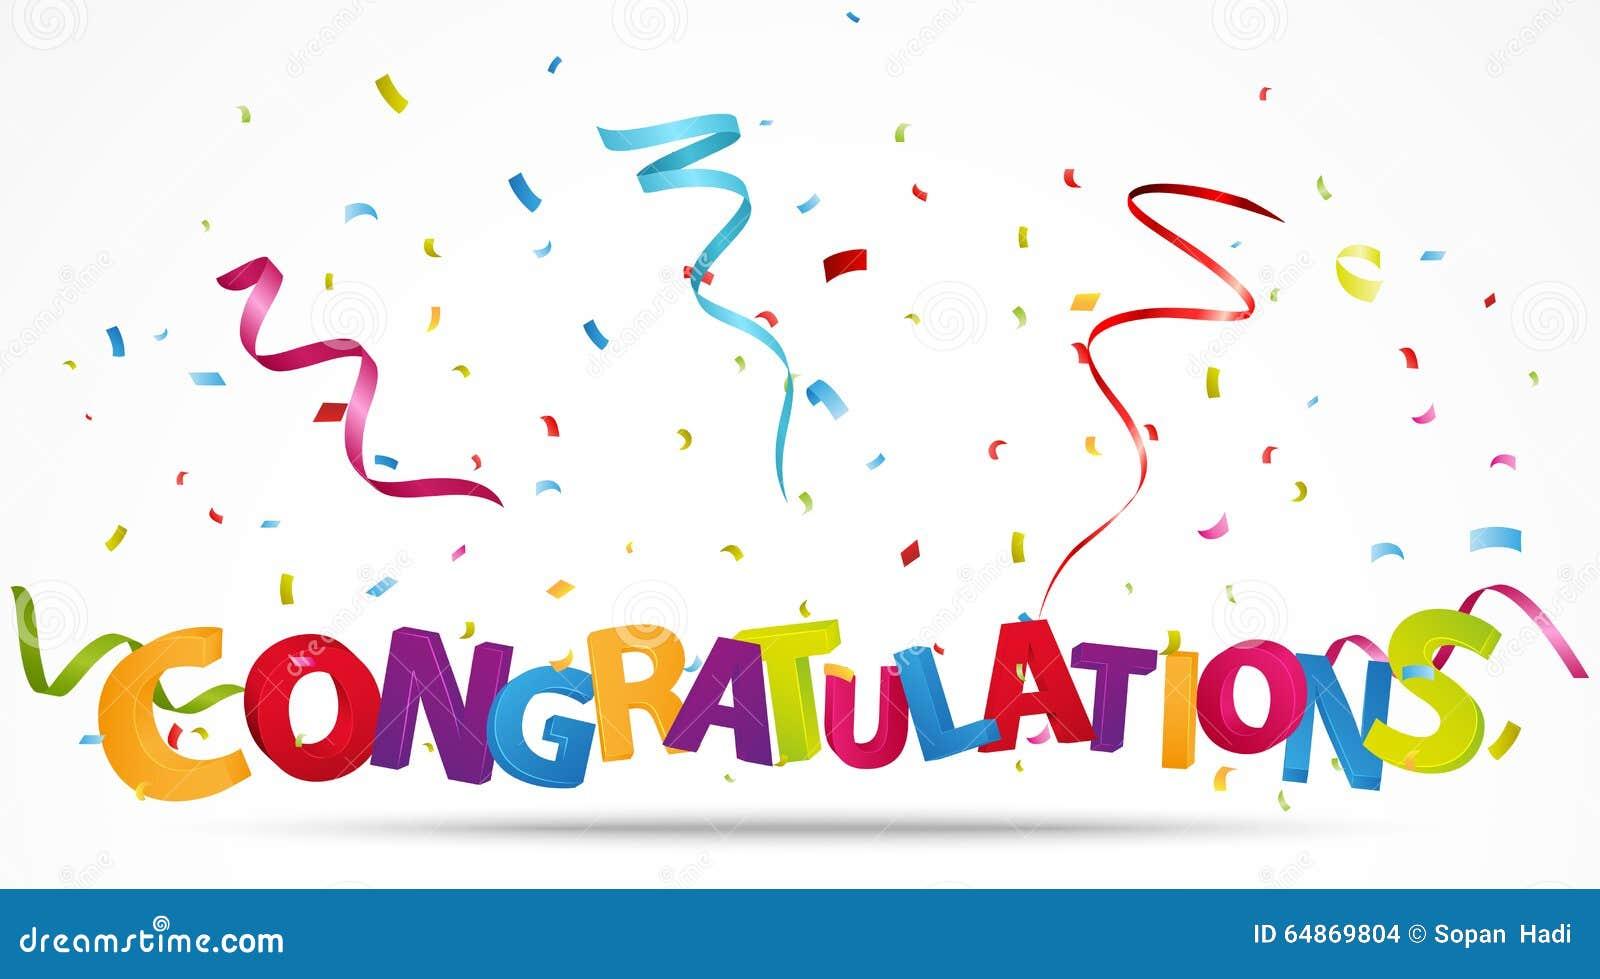 congratulations with confetti stock vector illustration of